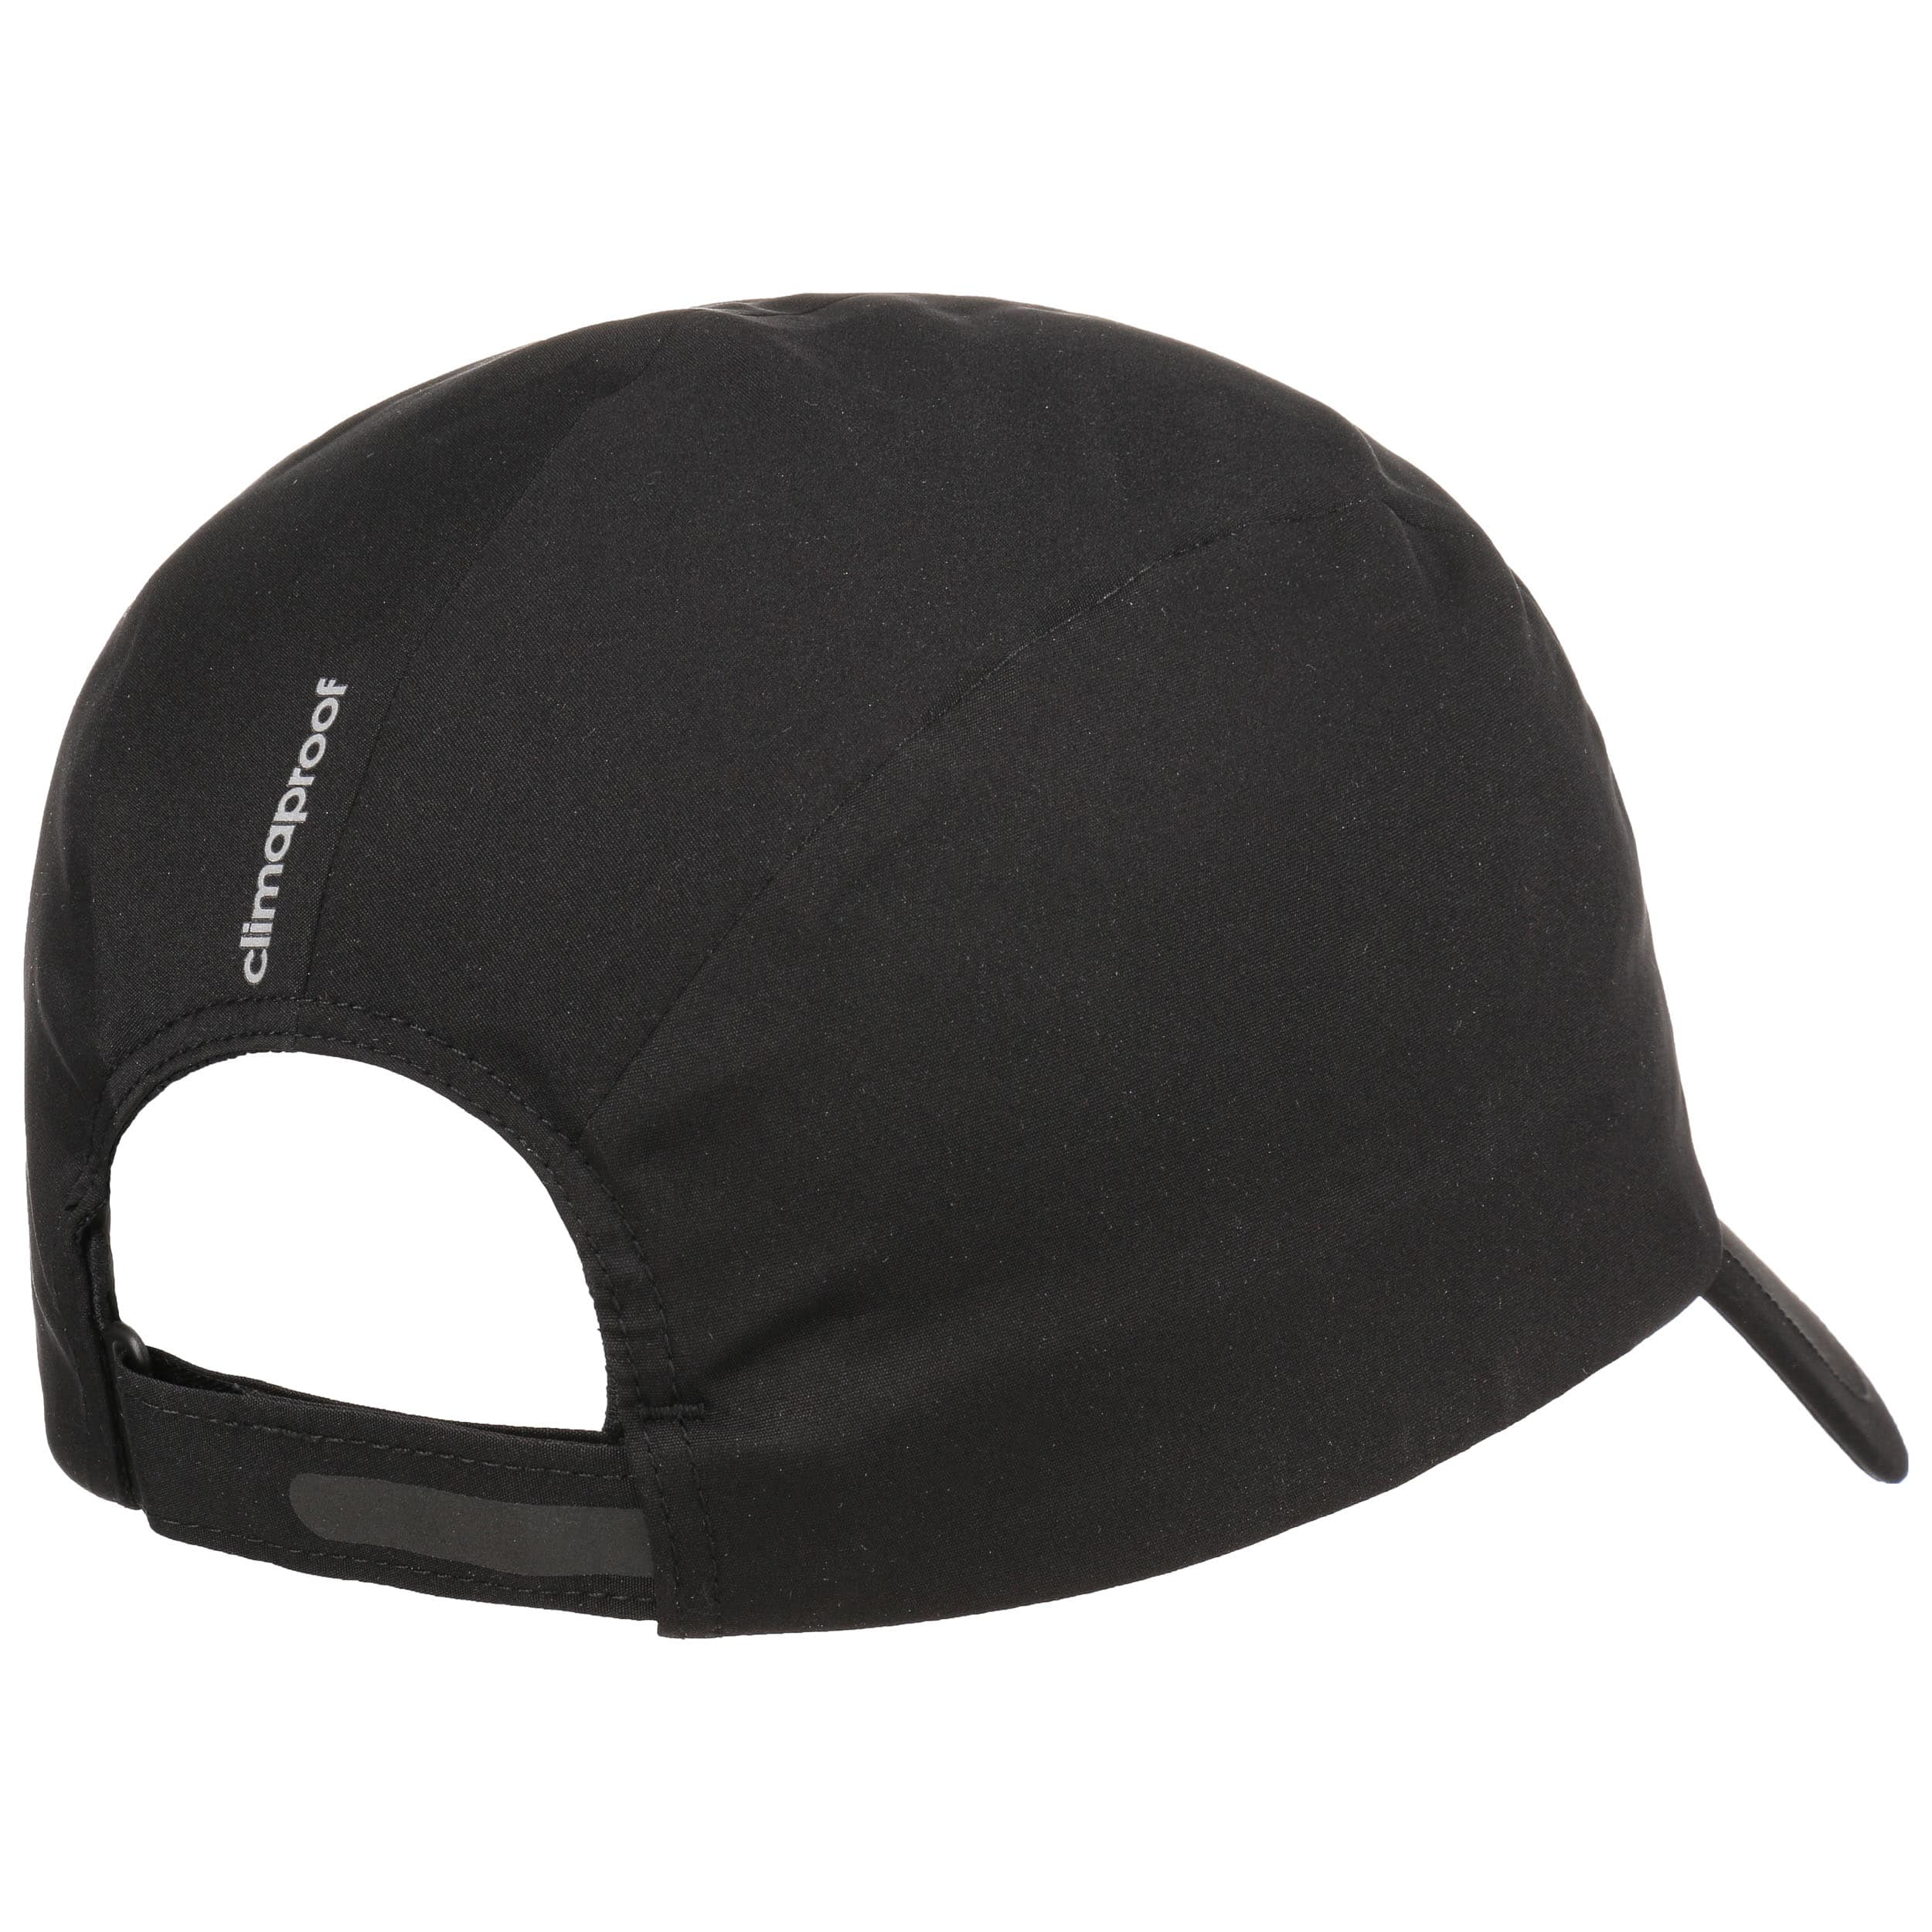 7871290cf63bb2 ... Climaproof Running Strapback Cap by adidas - black 3 ...